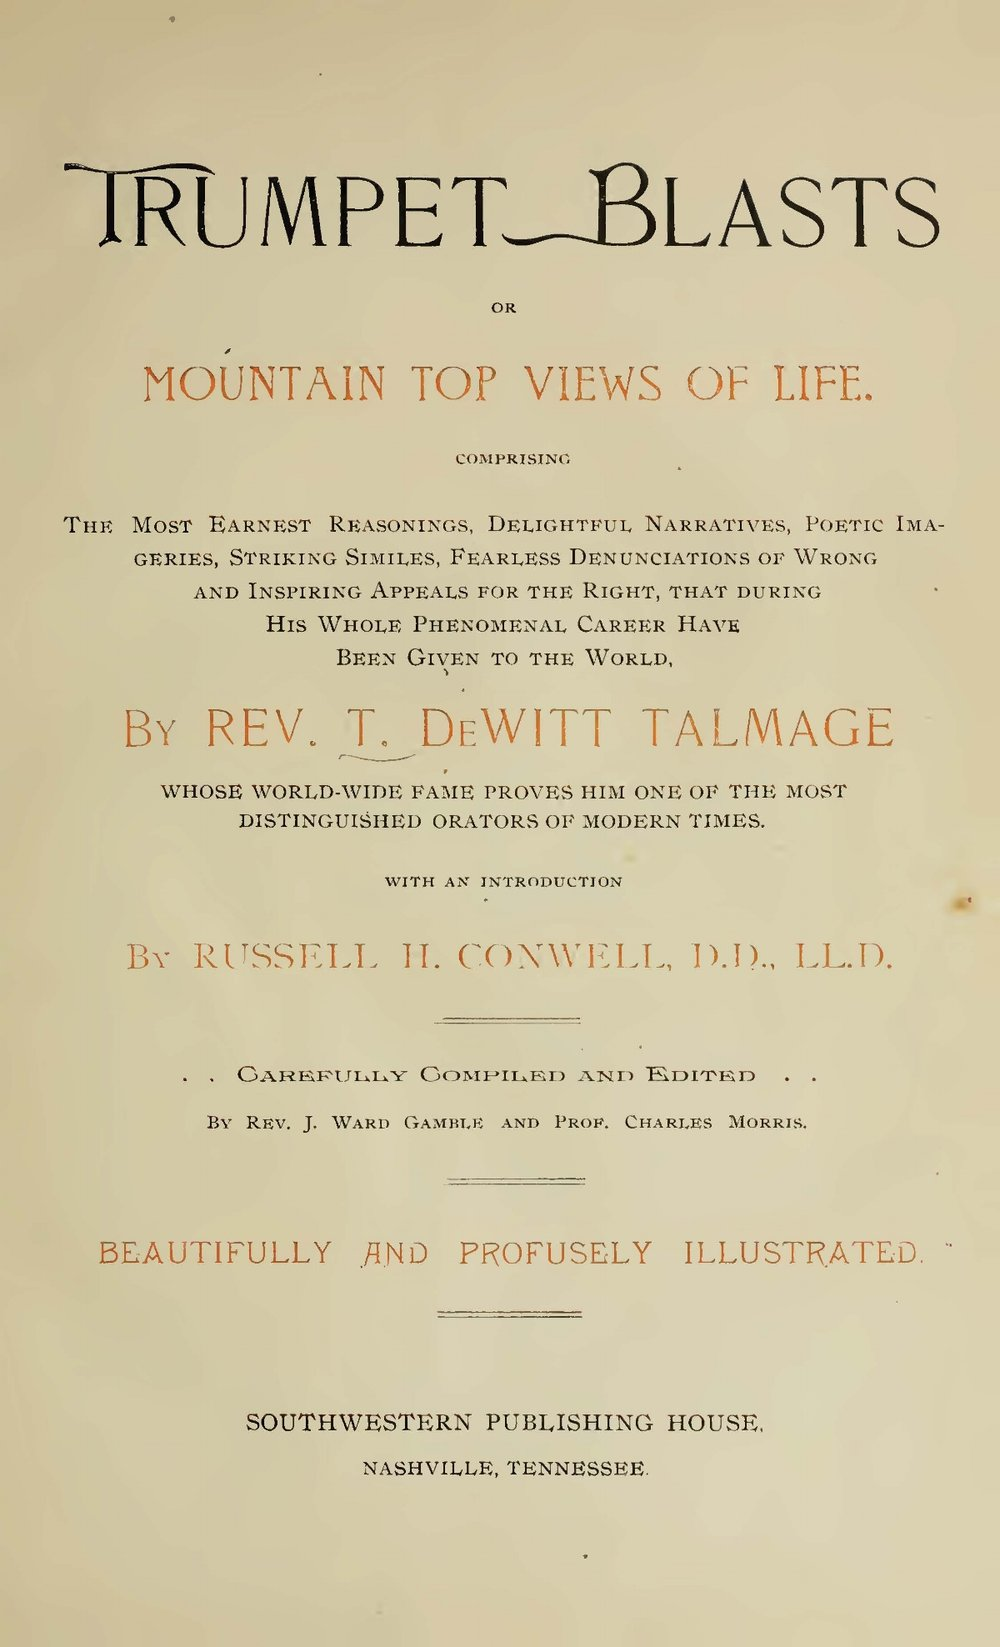 Talmage, Thomas De Witt, Trumpet Blasts Title Page.jpg